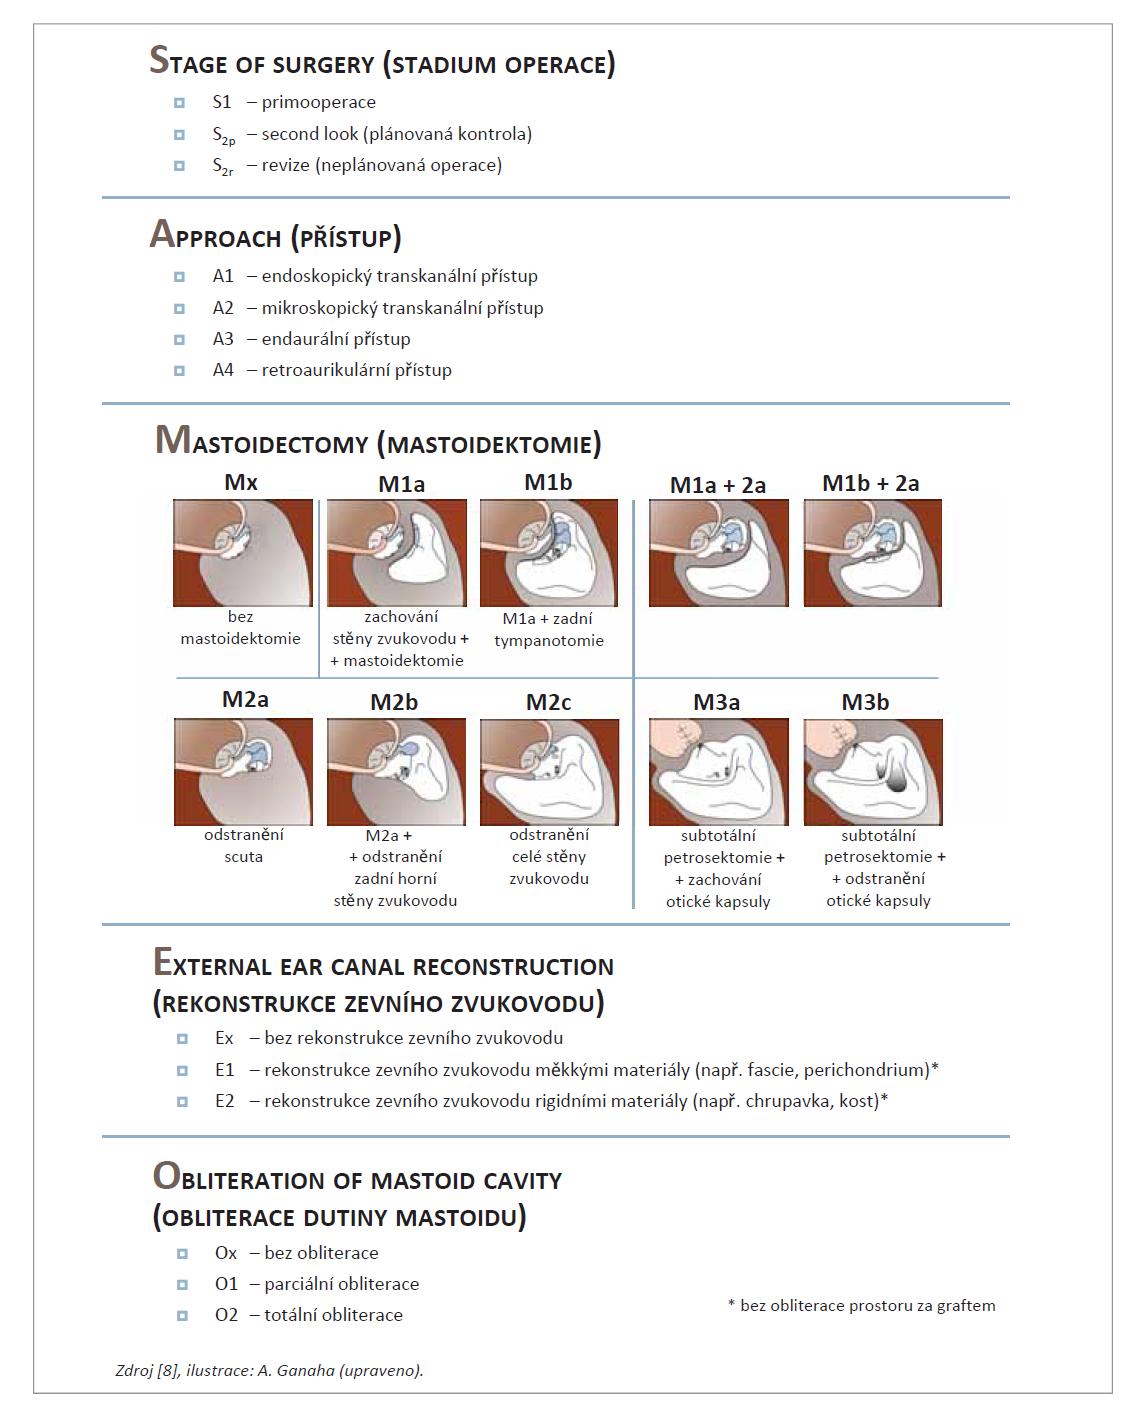 SAMEO klasifikace.<br> Tab. 1. SAMEO classification.